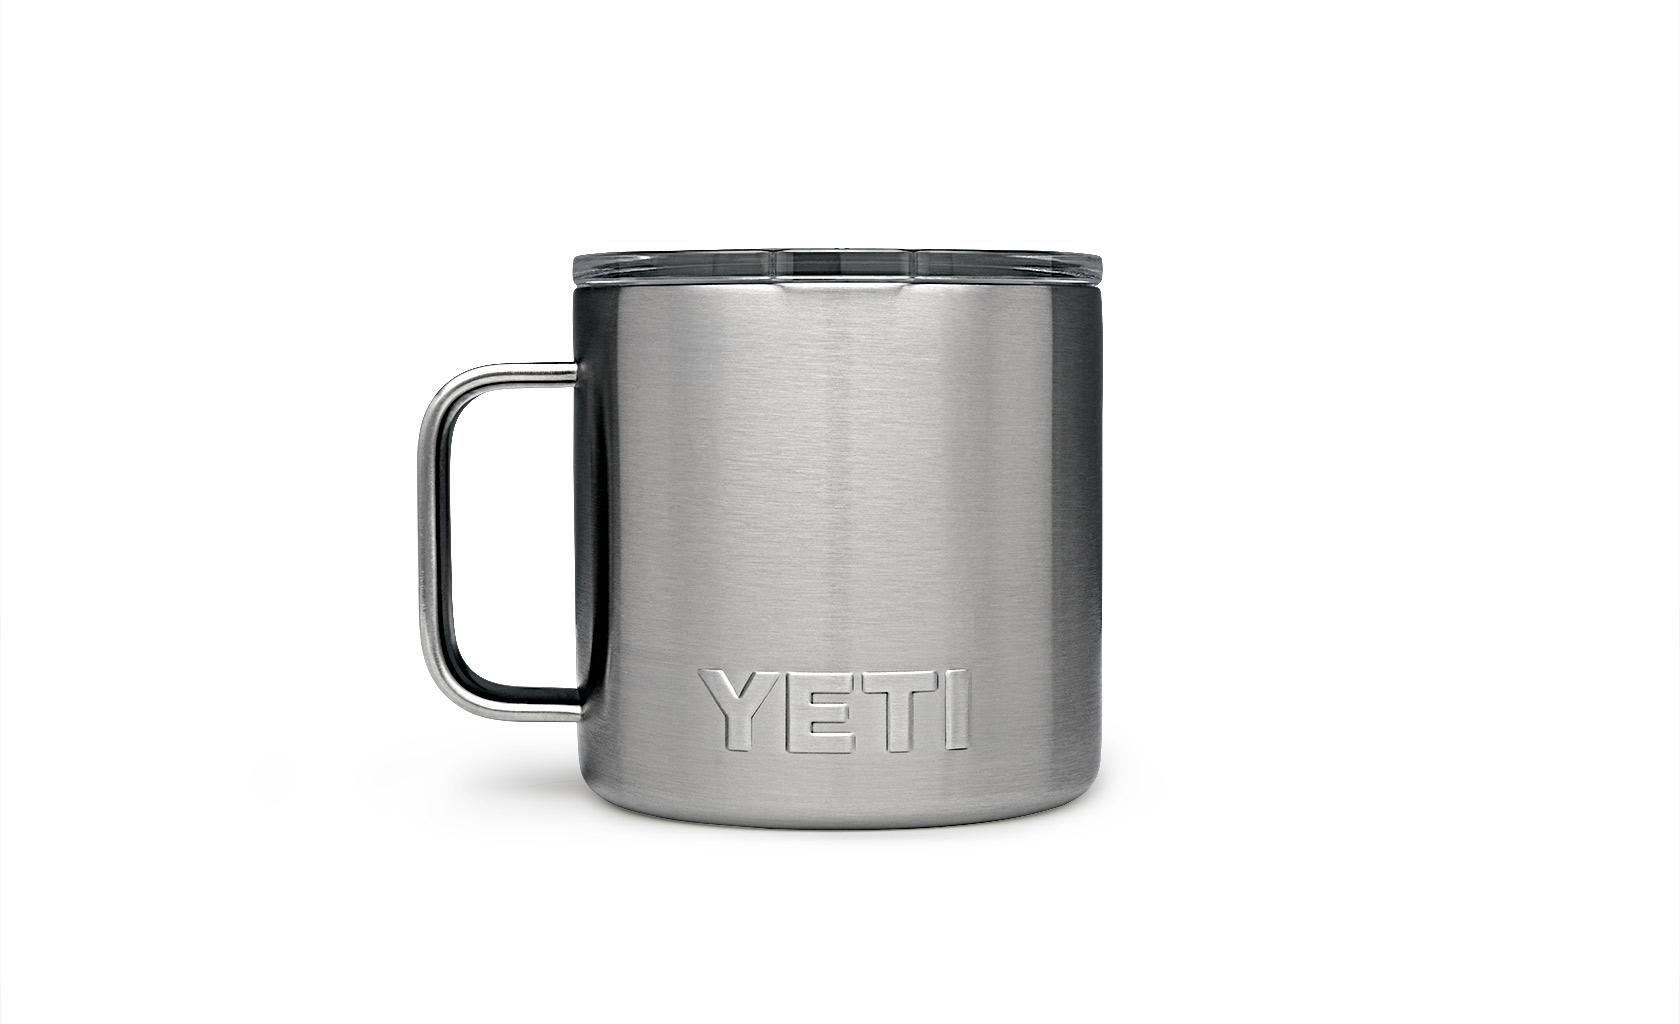 Yeti 14 oz mug stainless